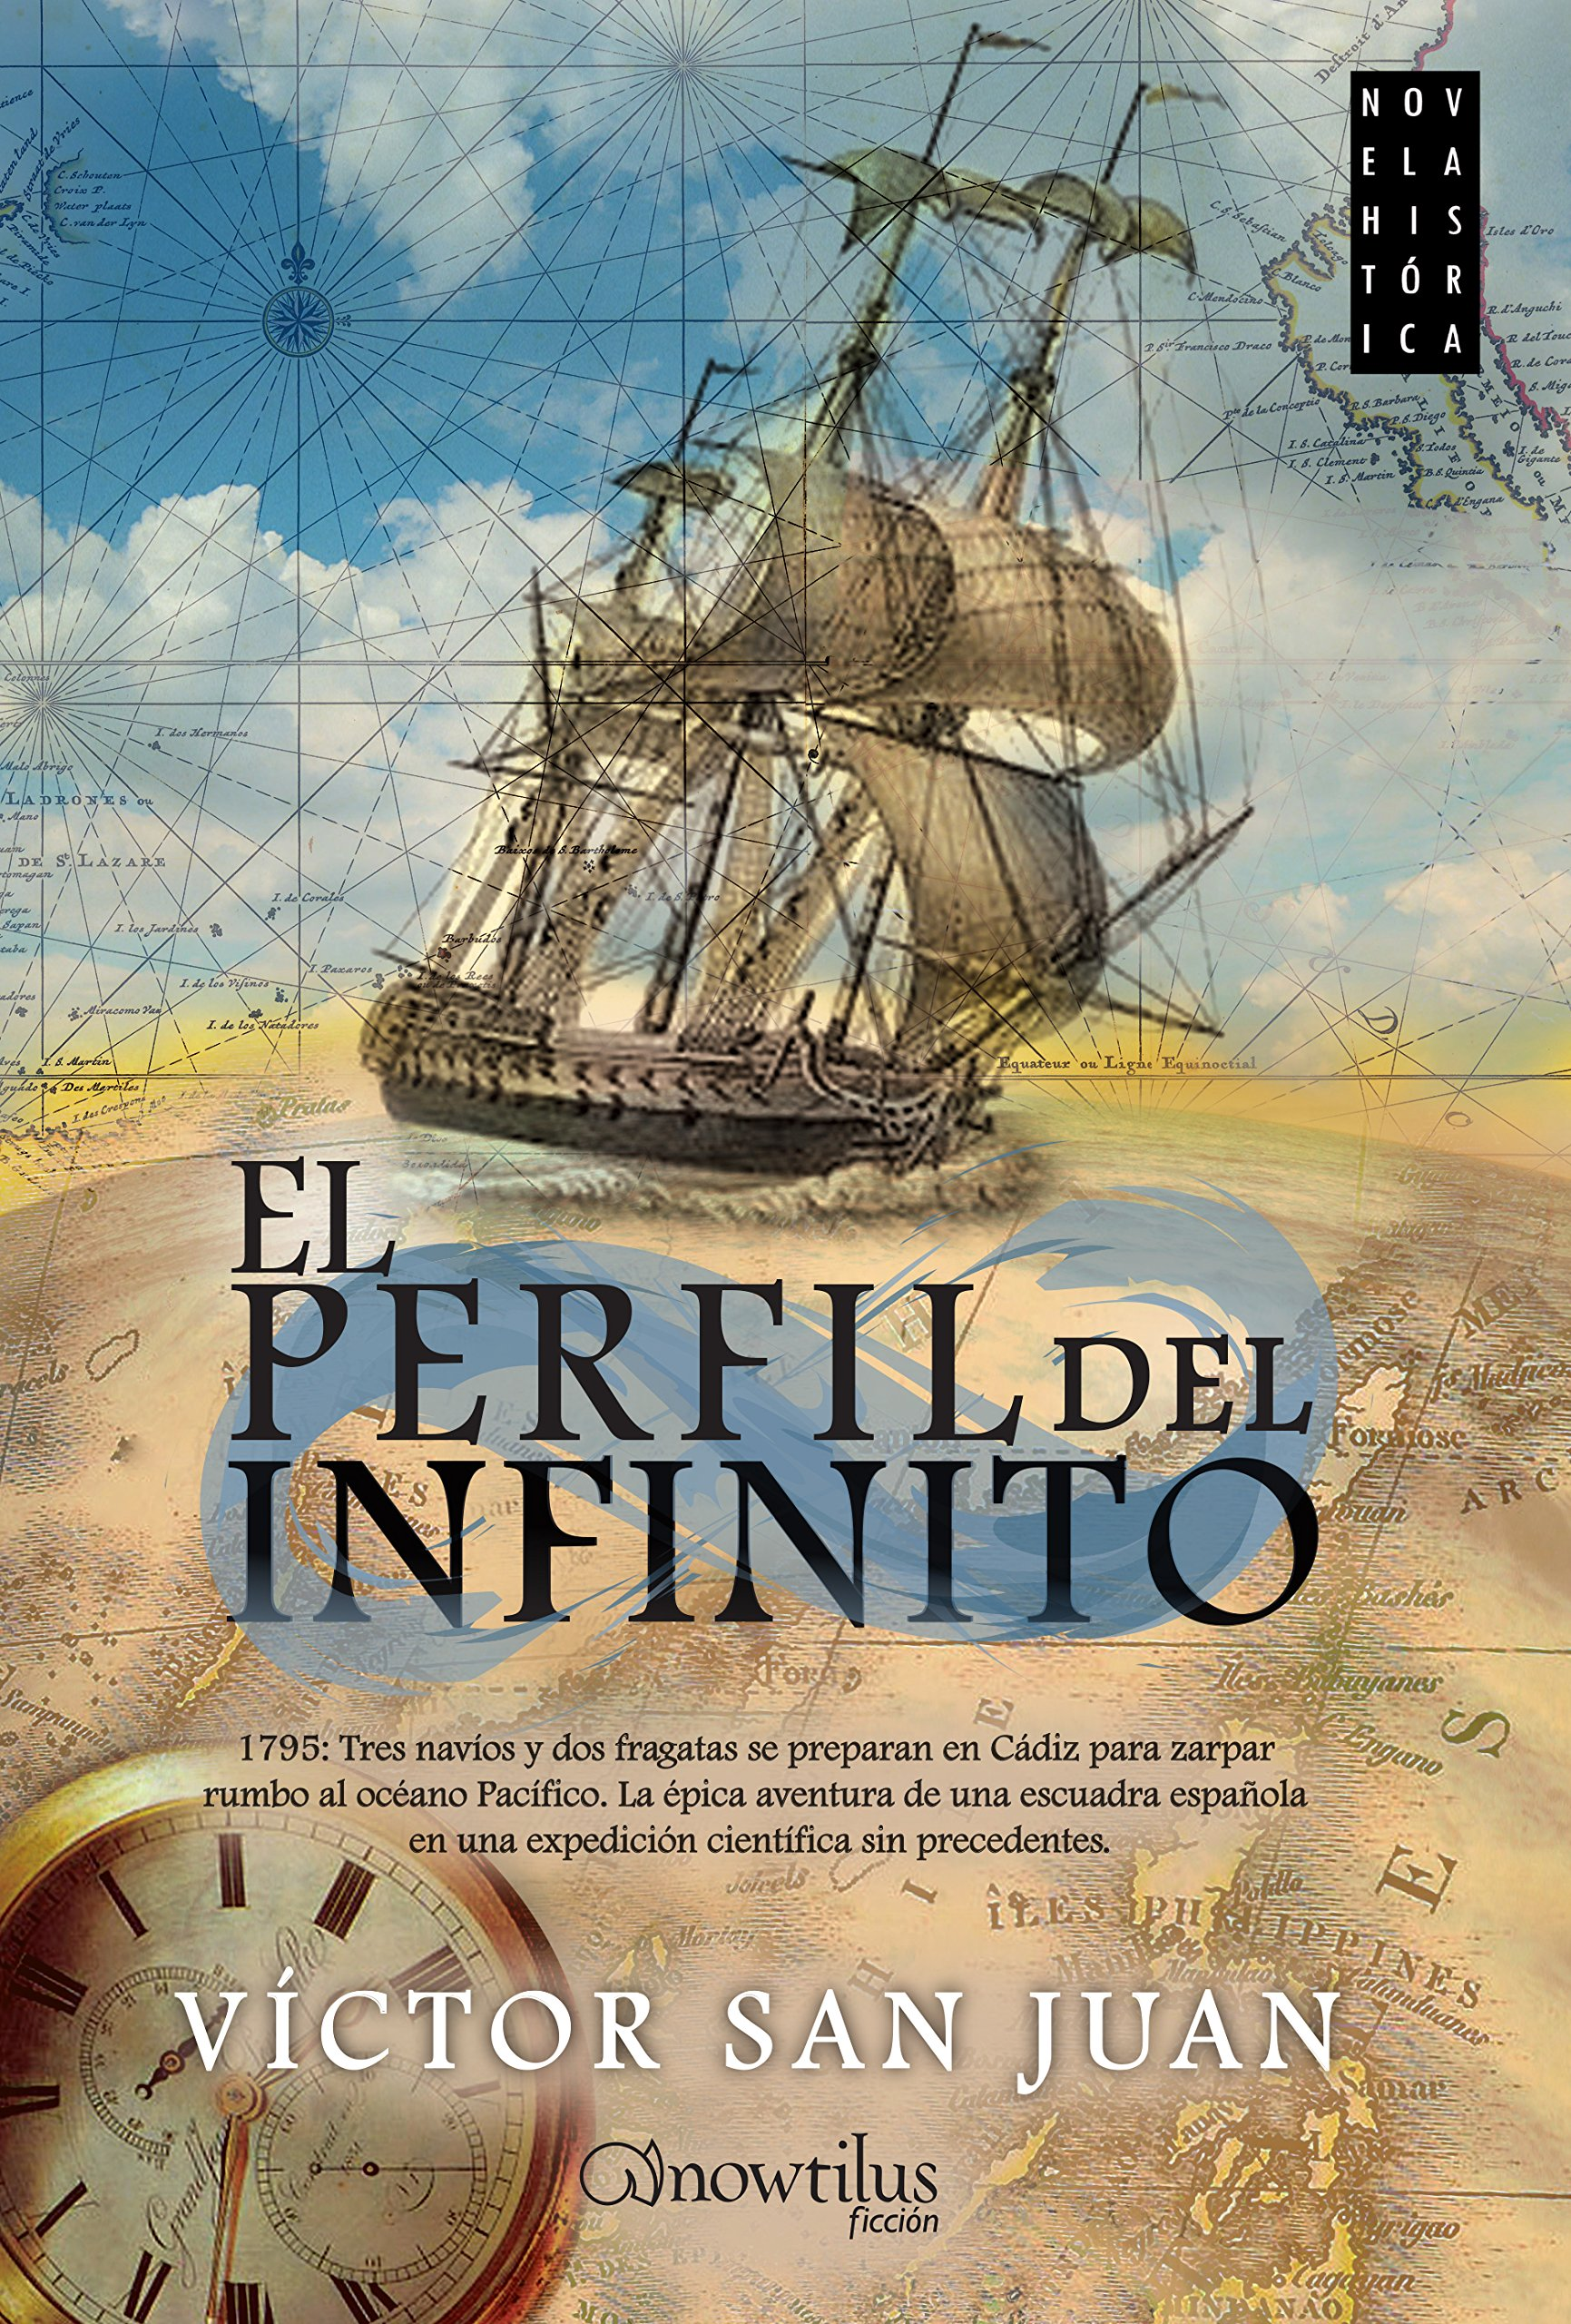 El perfil del infinito (Spanish) Paperback – 2016